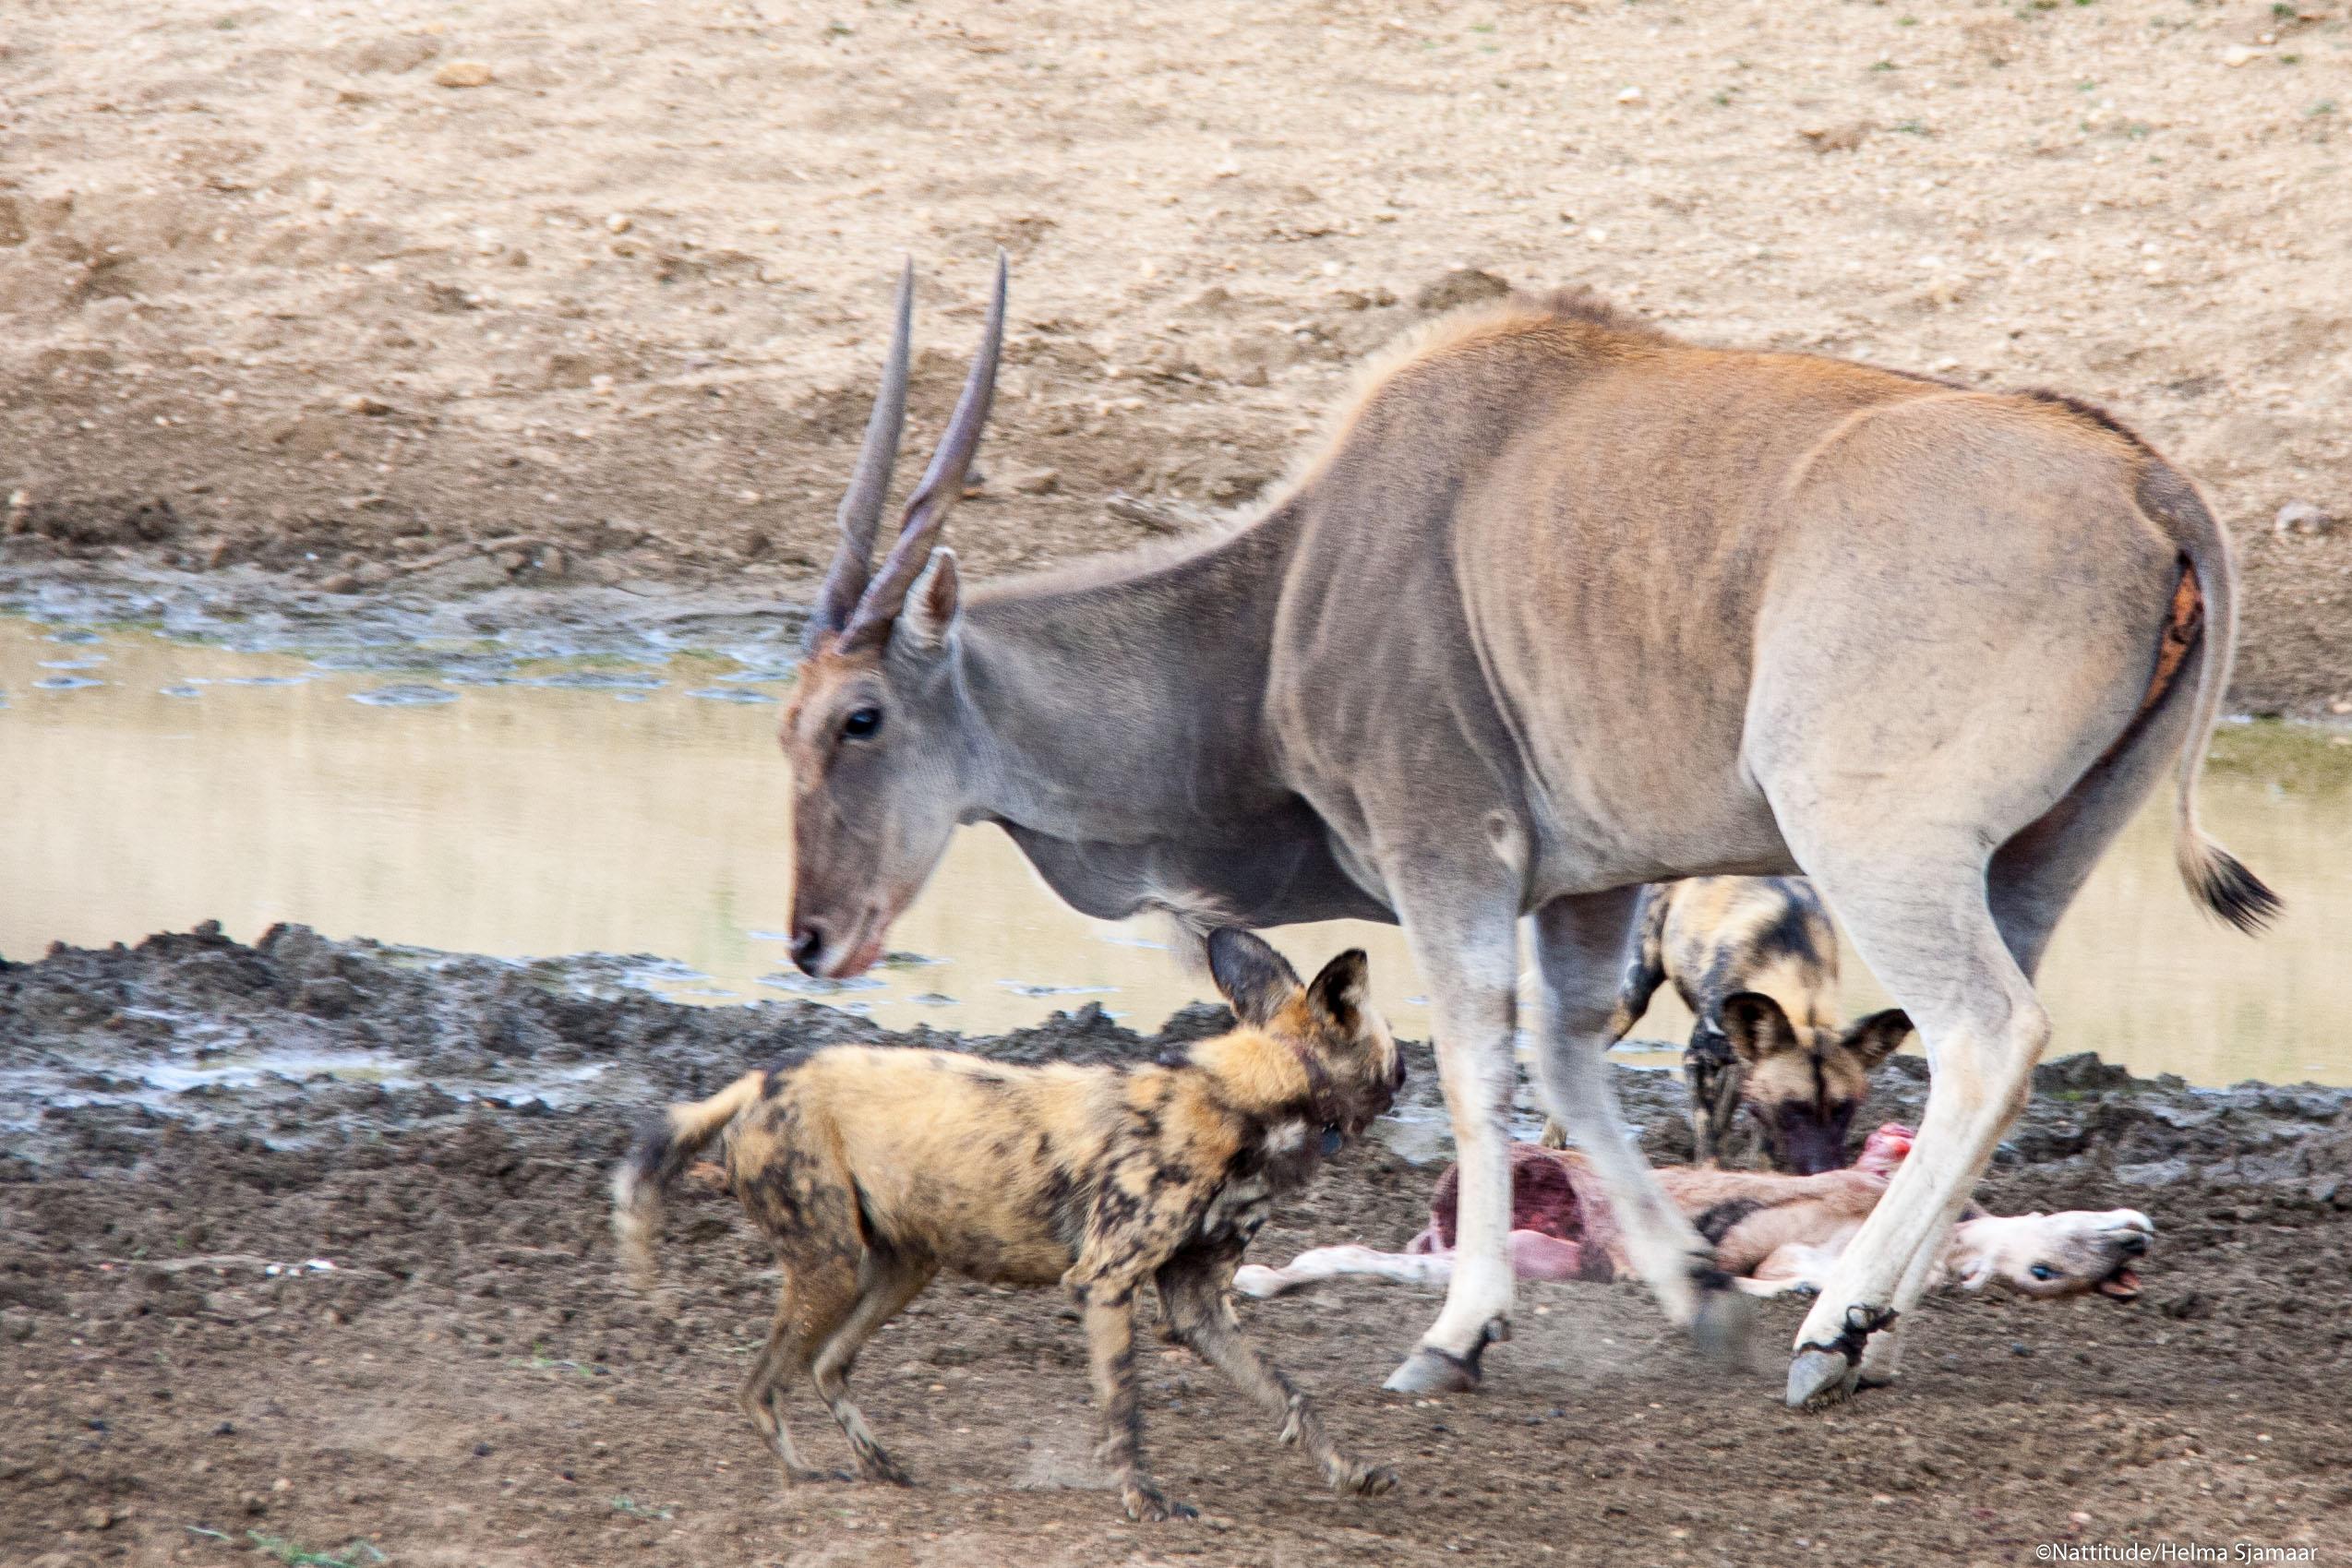 De eland verdedigt